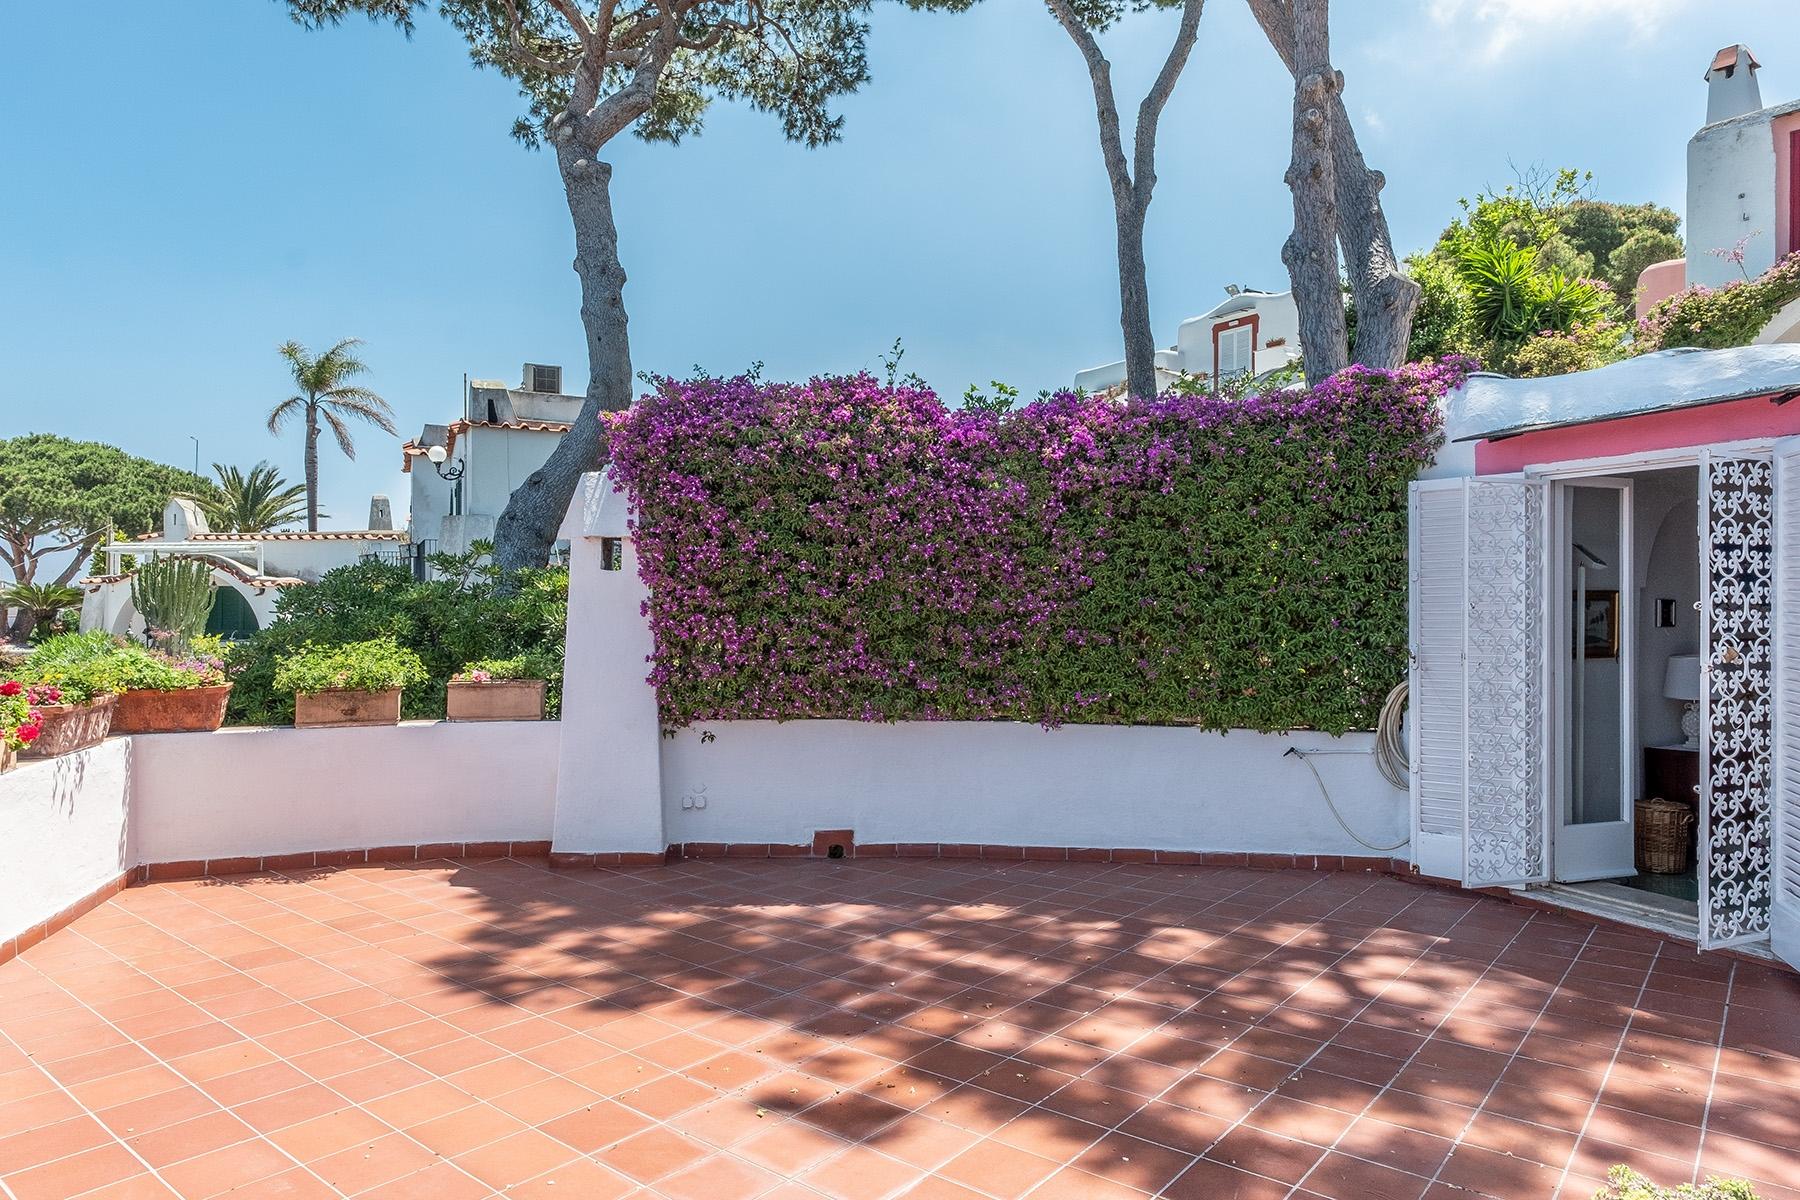 Villa in Vendita a Ischia: 5 locali, 206 mq - Foto 20